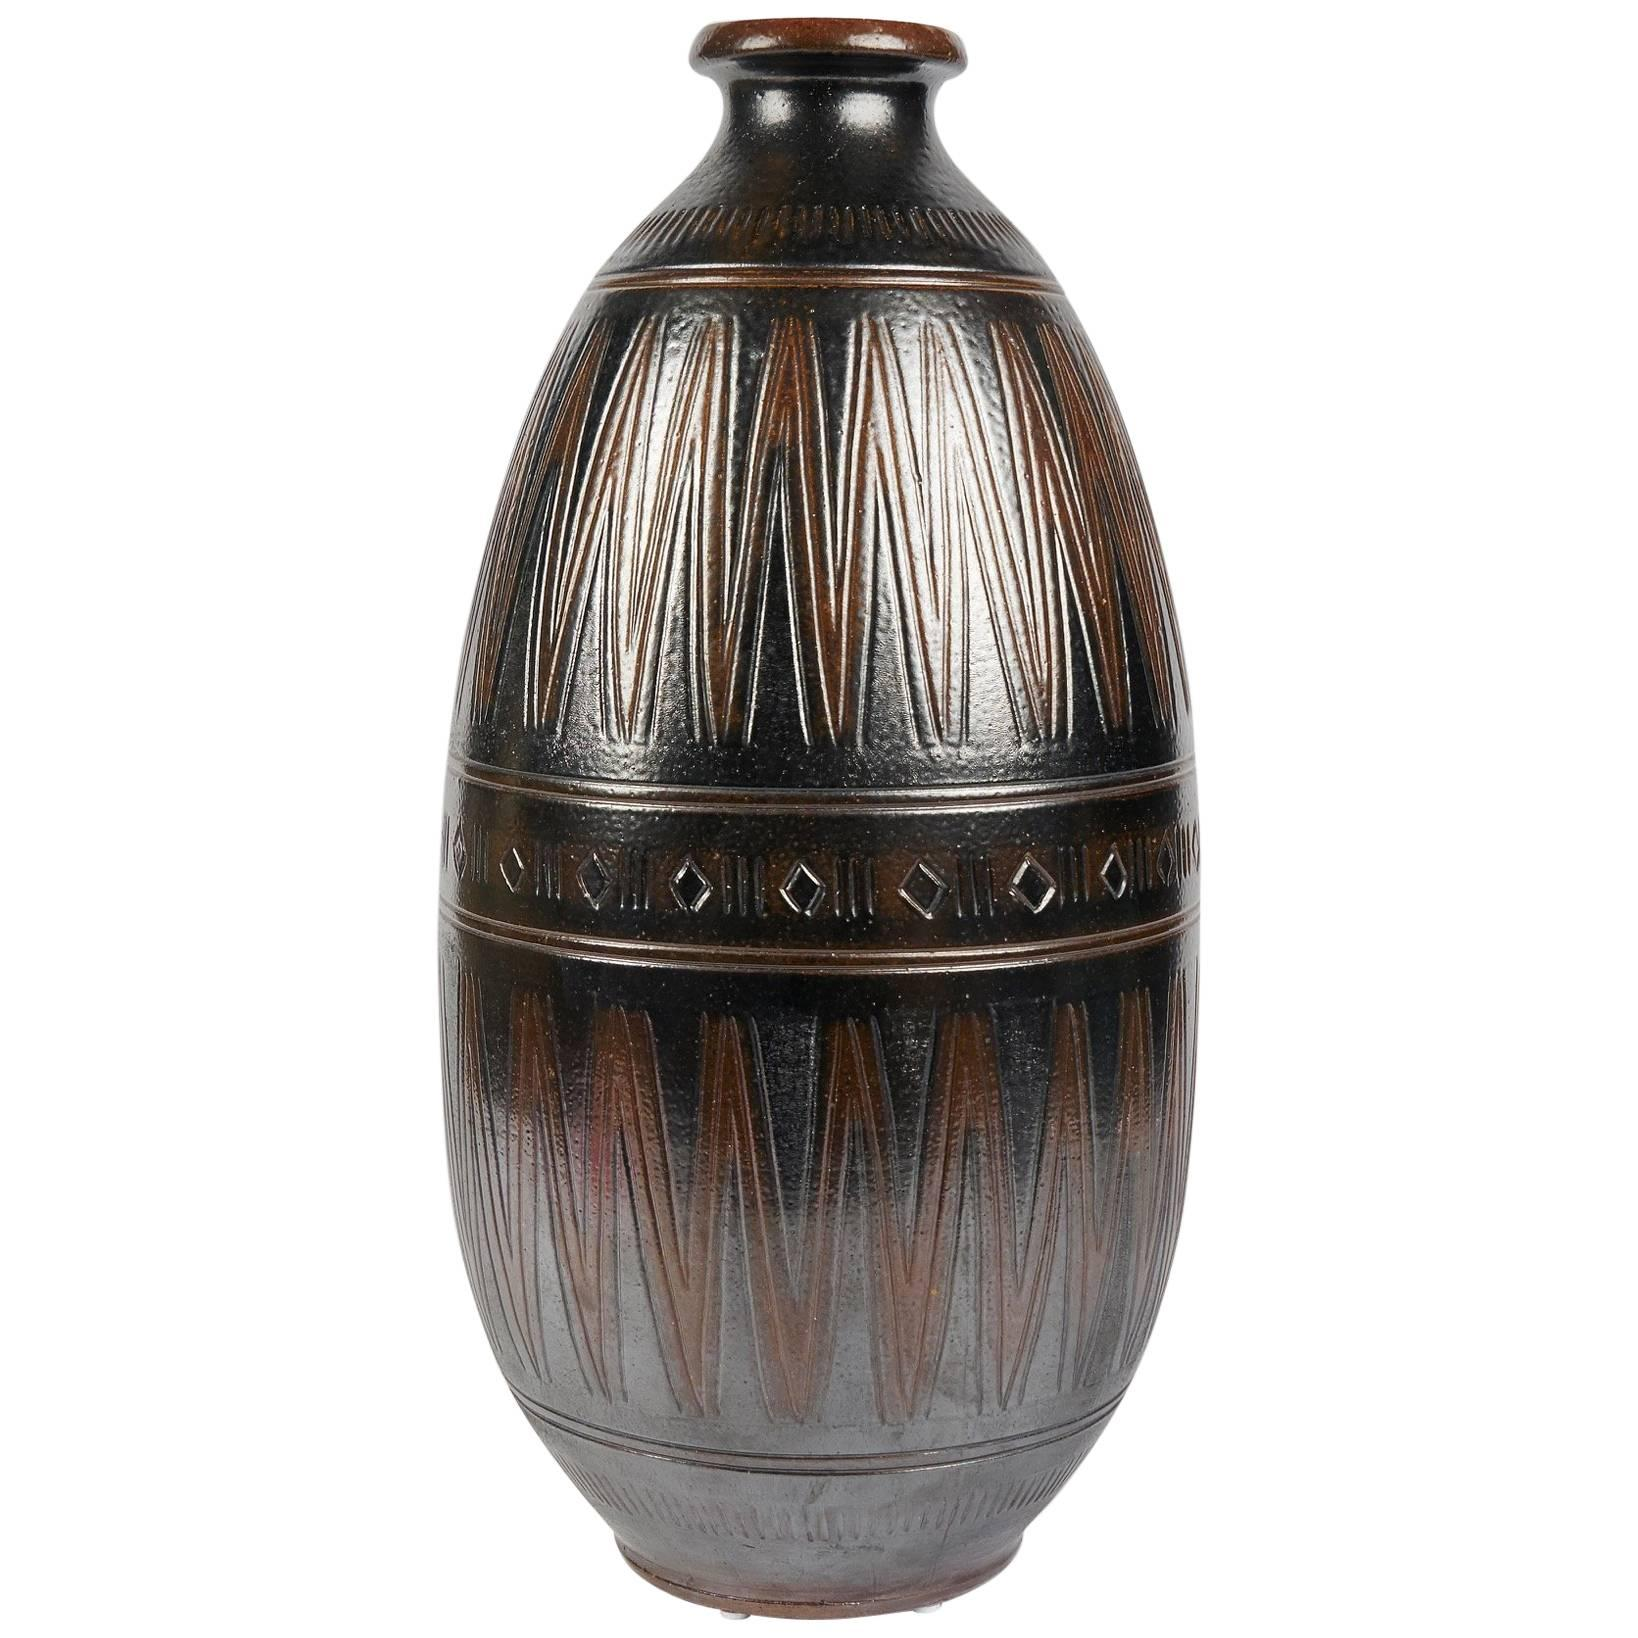 Arthur Andersson, Large Vase, Sweden, circa 1950s